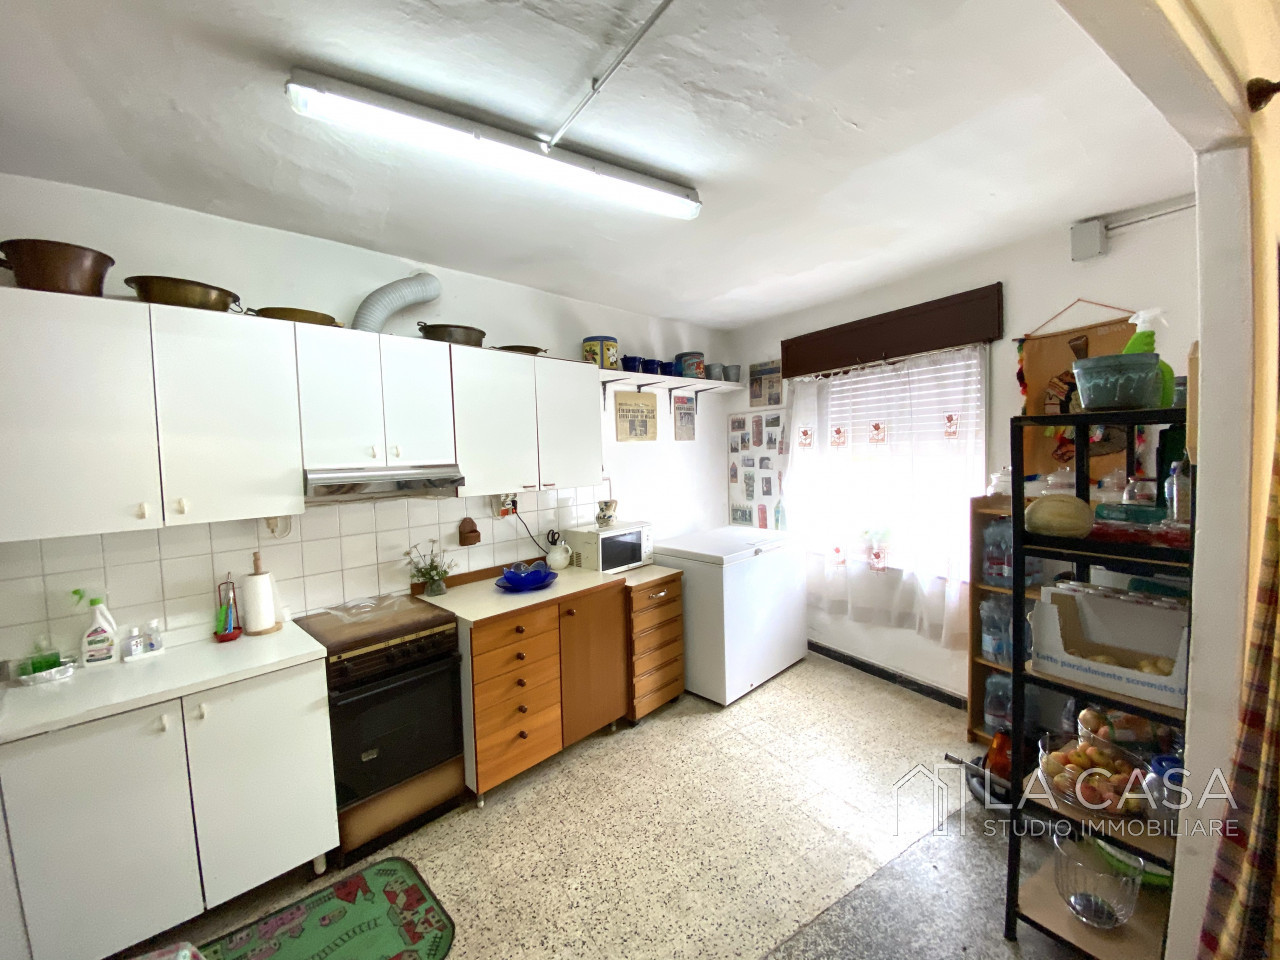 Palazzo plurifamiliare in vendita a Valvasone Arzene - Rif. P3 https://images.gestionaleimmobiliare.it/foto/annunci/200827/2284141/1280x1280/006__img_3701_wmk_0.jpg